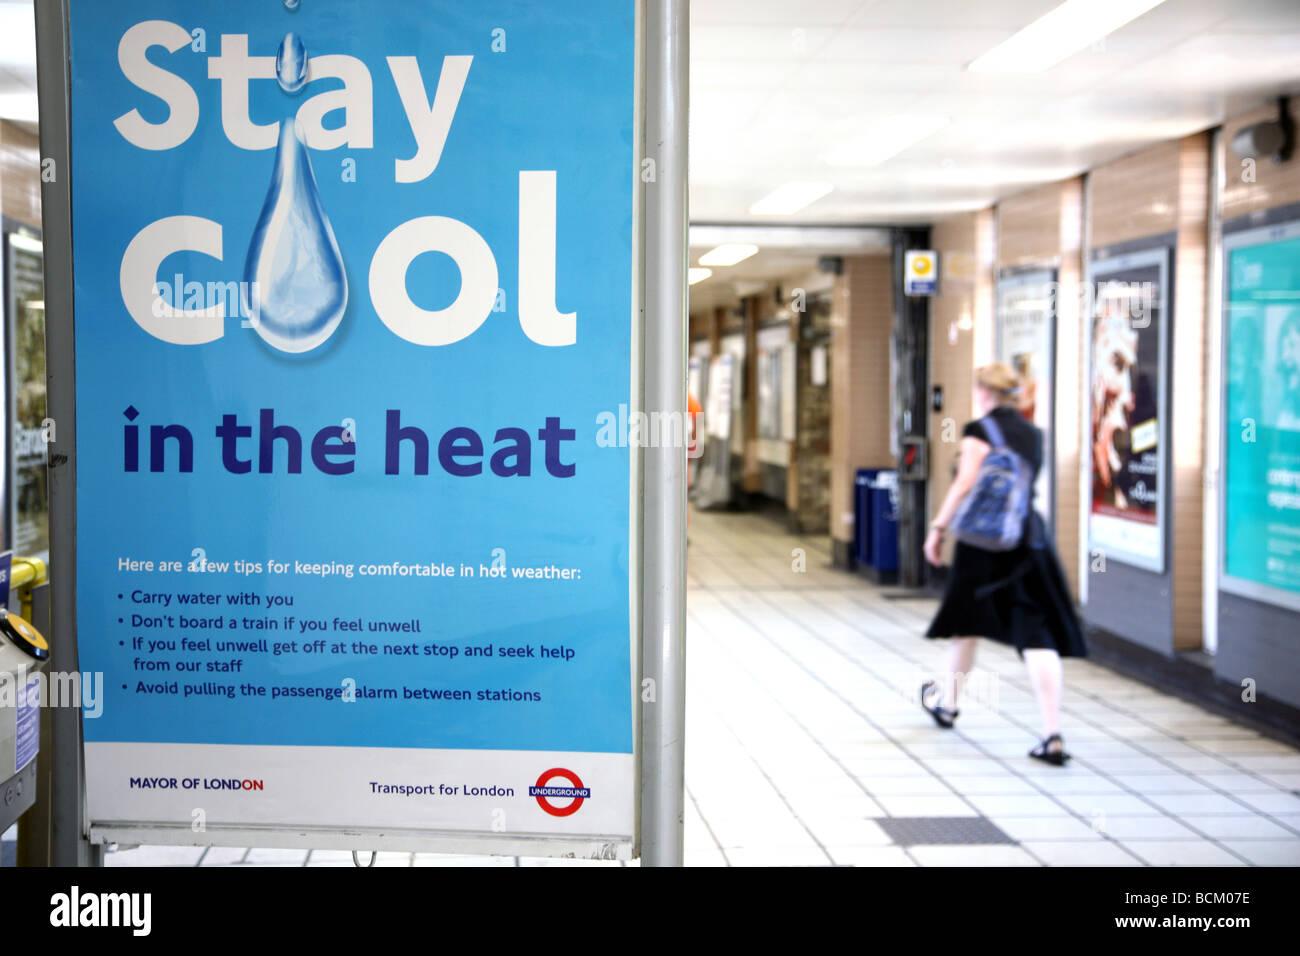 Hot weather advice in London Underground station - Stock Image